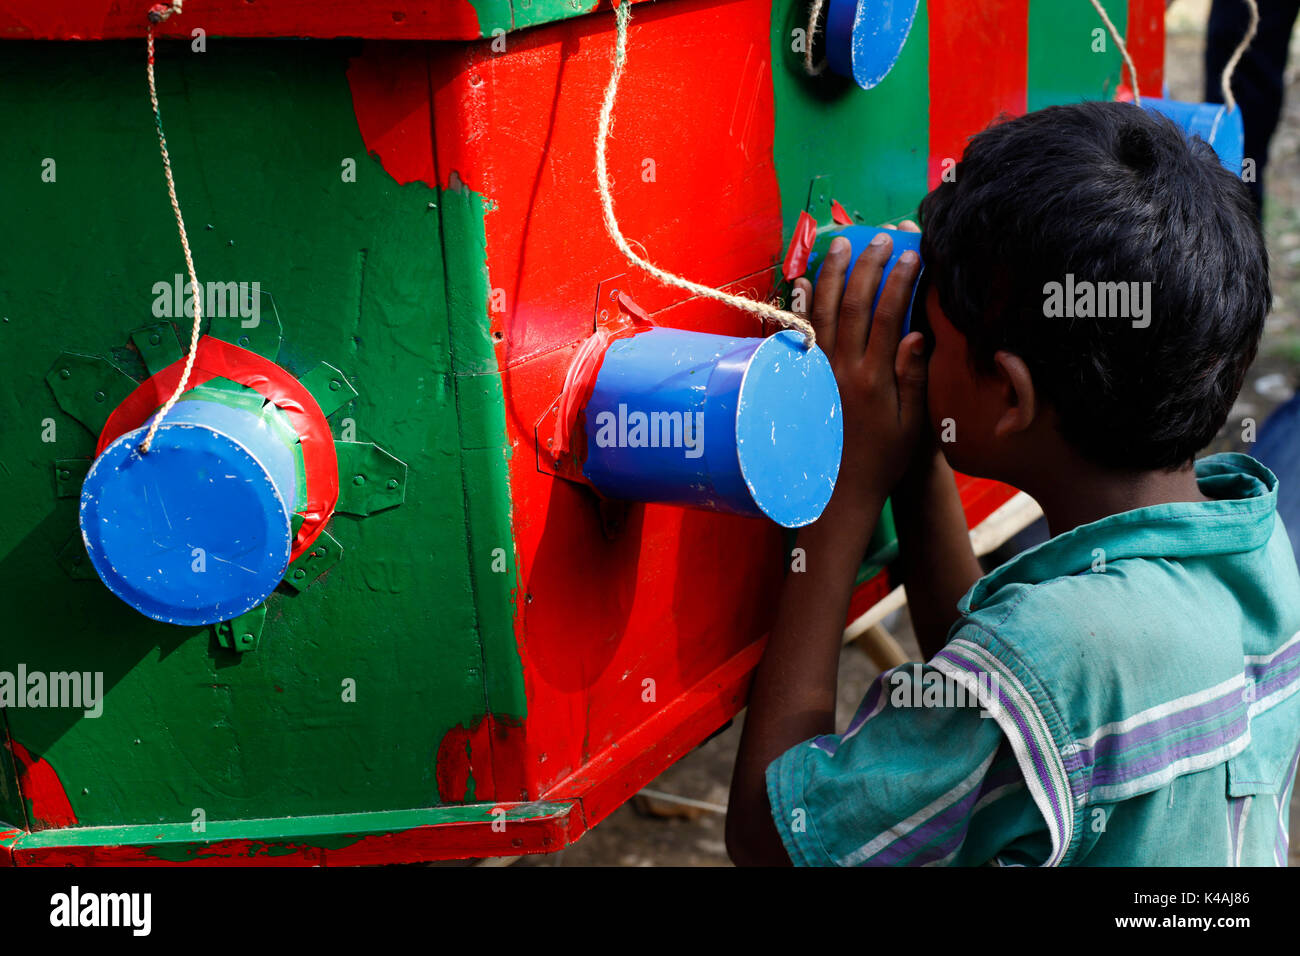 Suhrawardy Udyan Stock Photos & Suhrawardy Udyan Stock